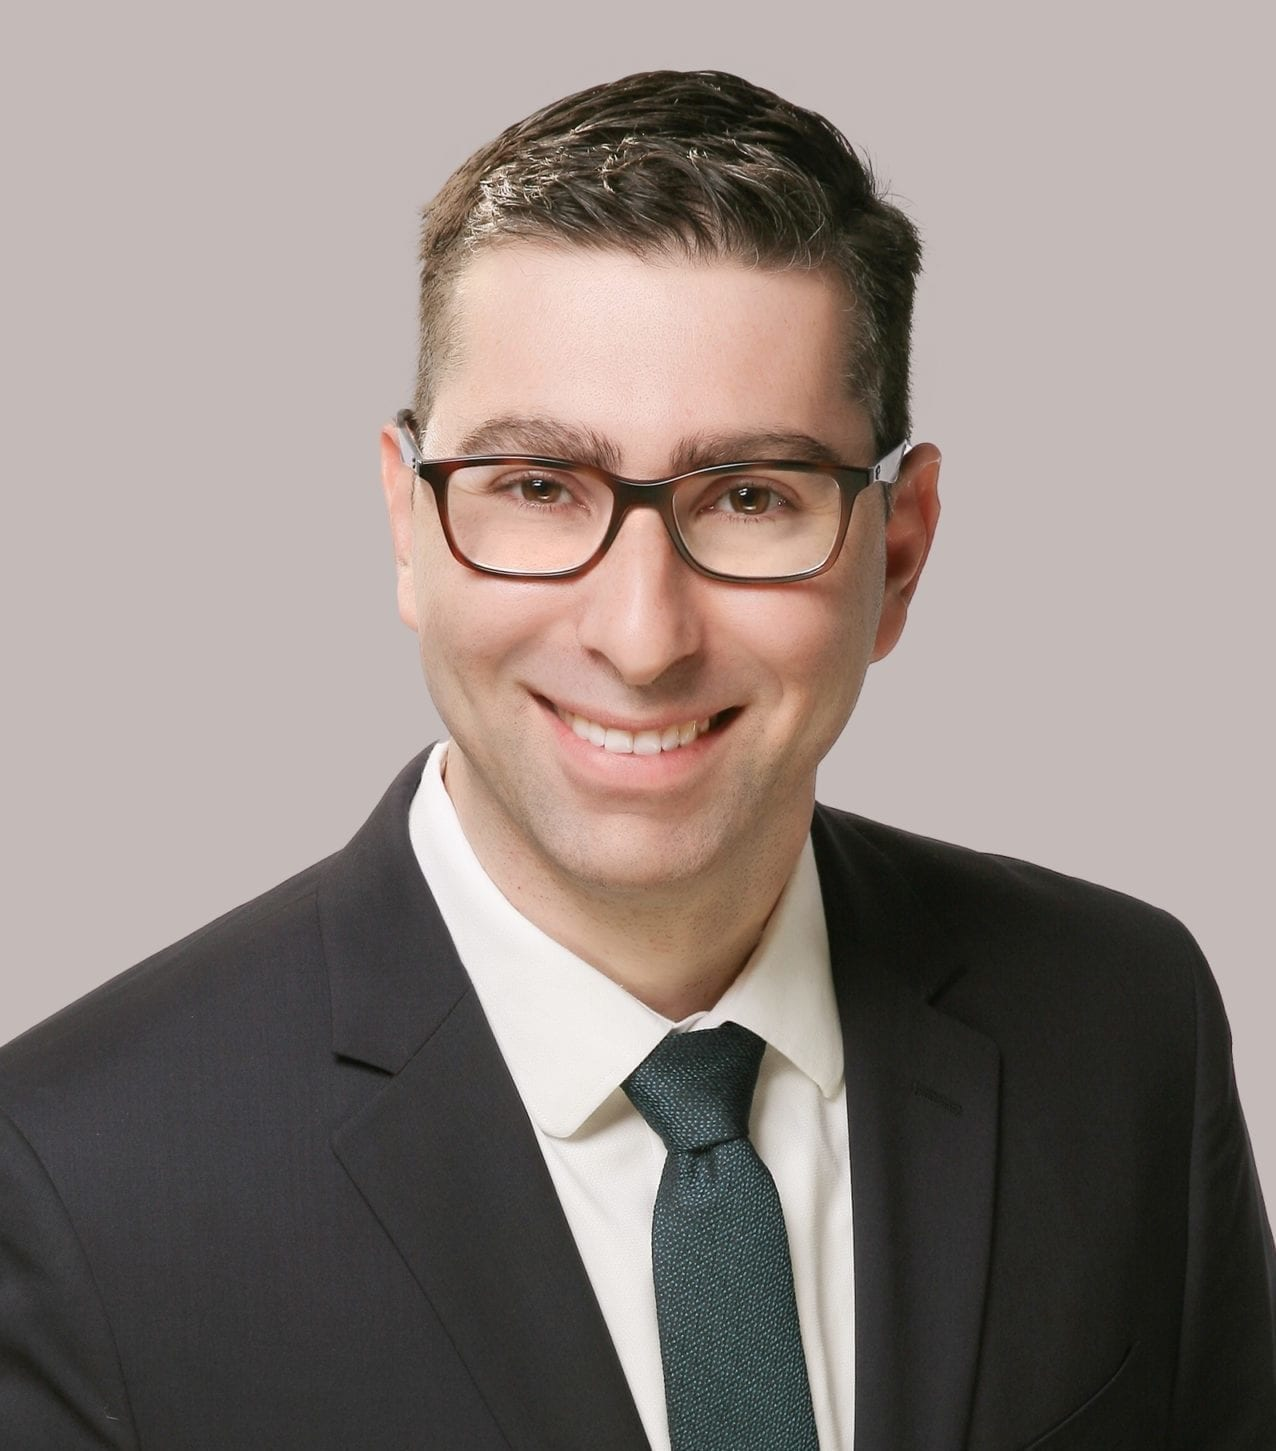 Dr. Ara Mirzaians headshot